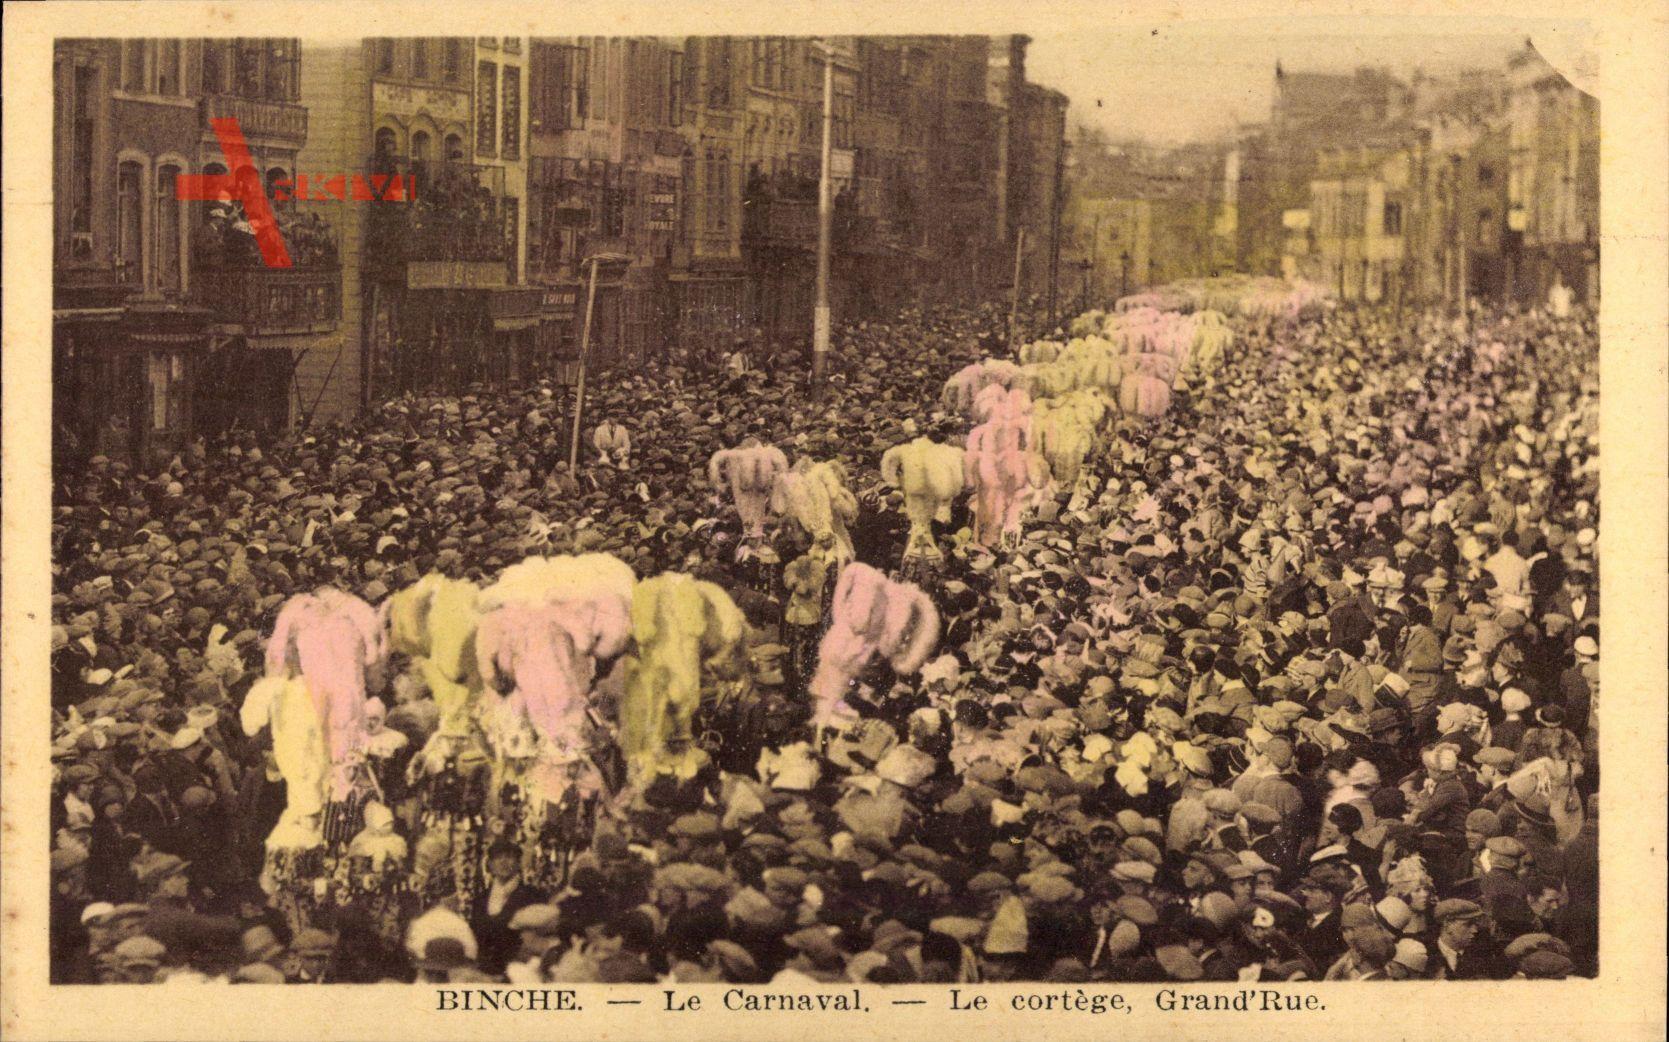 Binche Wallonien Hennegau, Le Carnaval, Le cortège, Grand'Rue